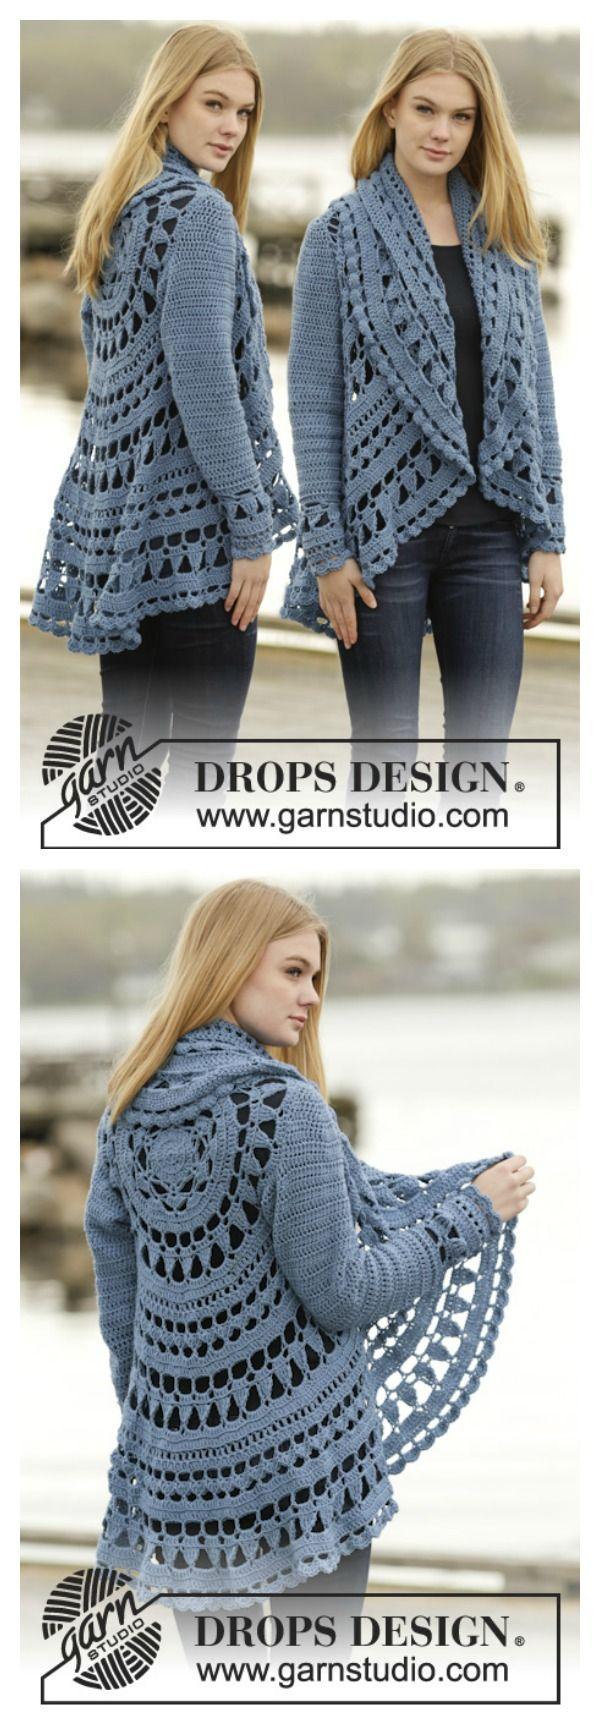 Knit Vest Pattern In The Round : Crochet Pretty Circle Jacket with Pattern Virkning, Monster och Sy